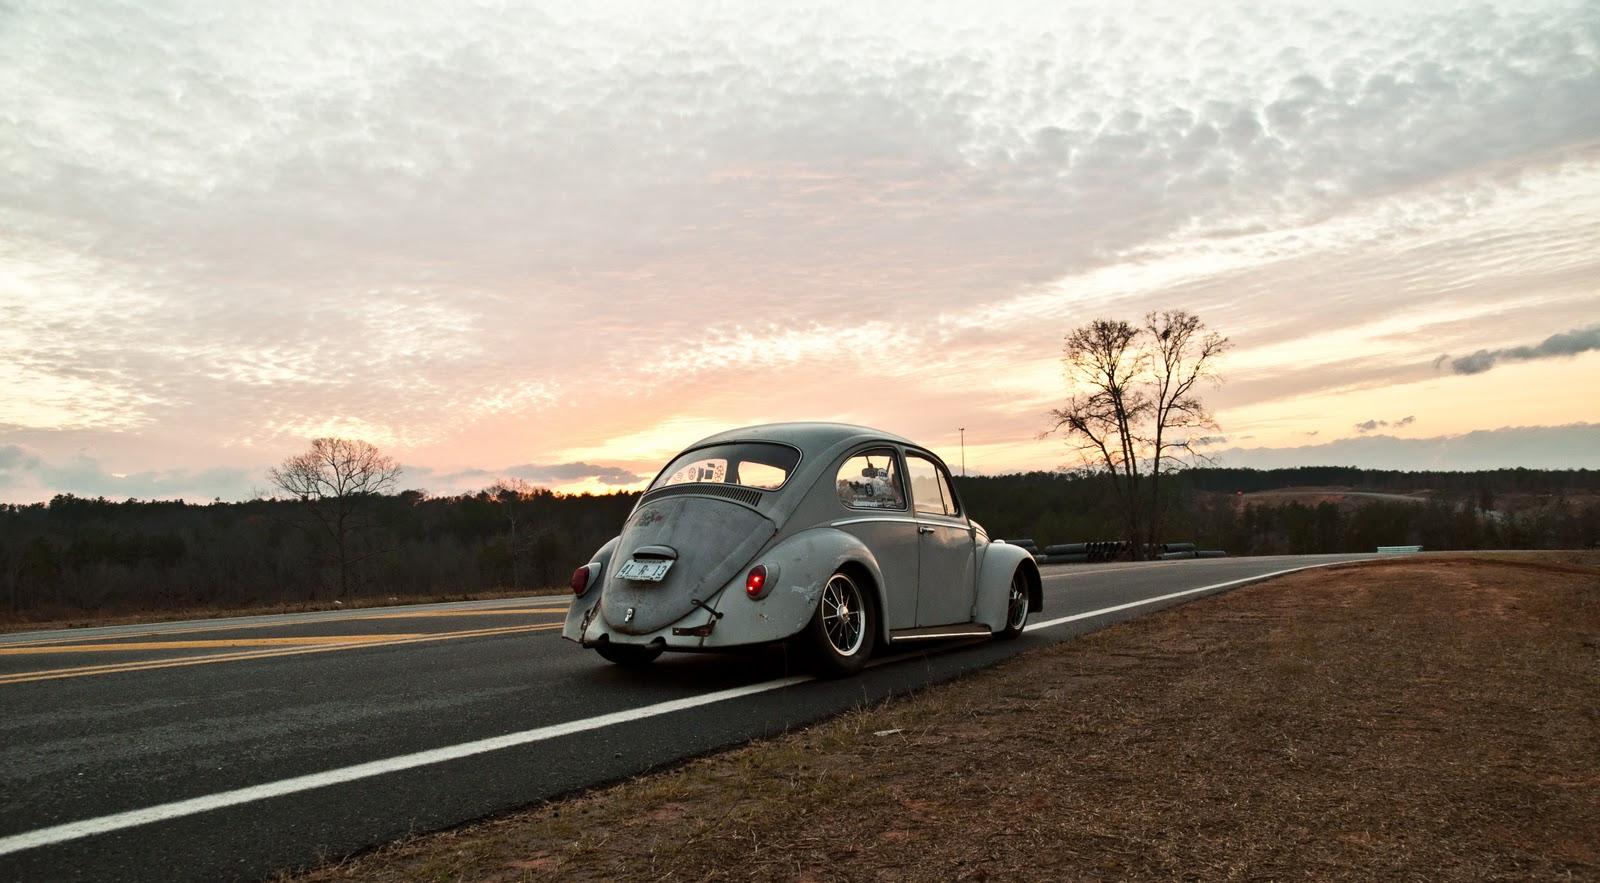 Otis - my '65 Beetle DSC_0057